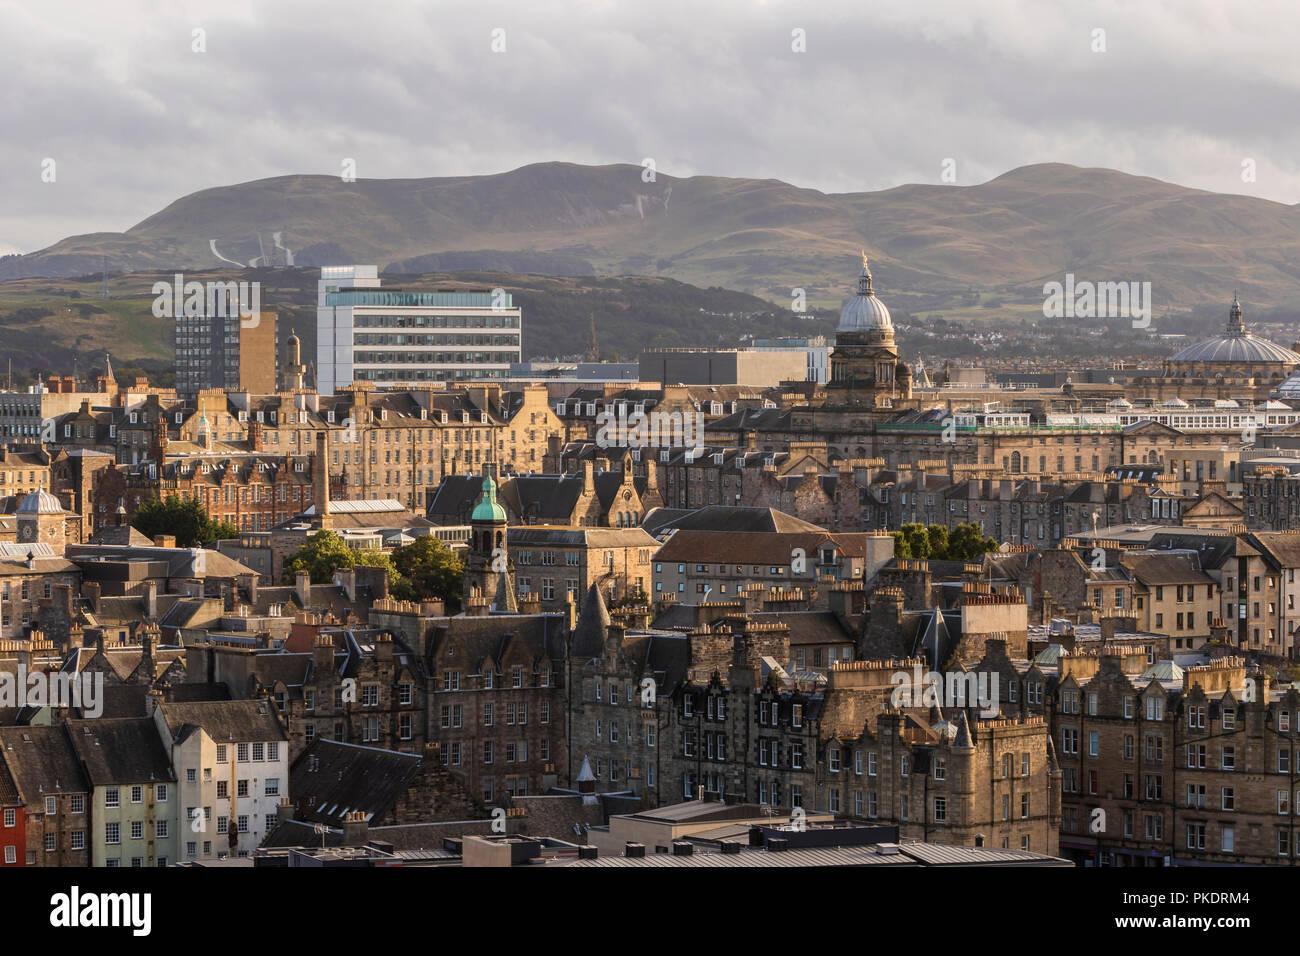 Edinburgh University Old College and the Pentlands, Skyline Scotland - Stock Image